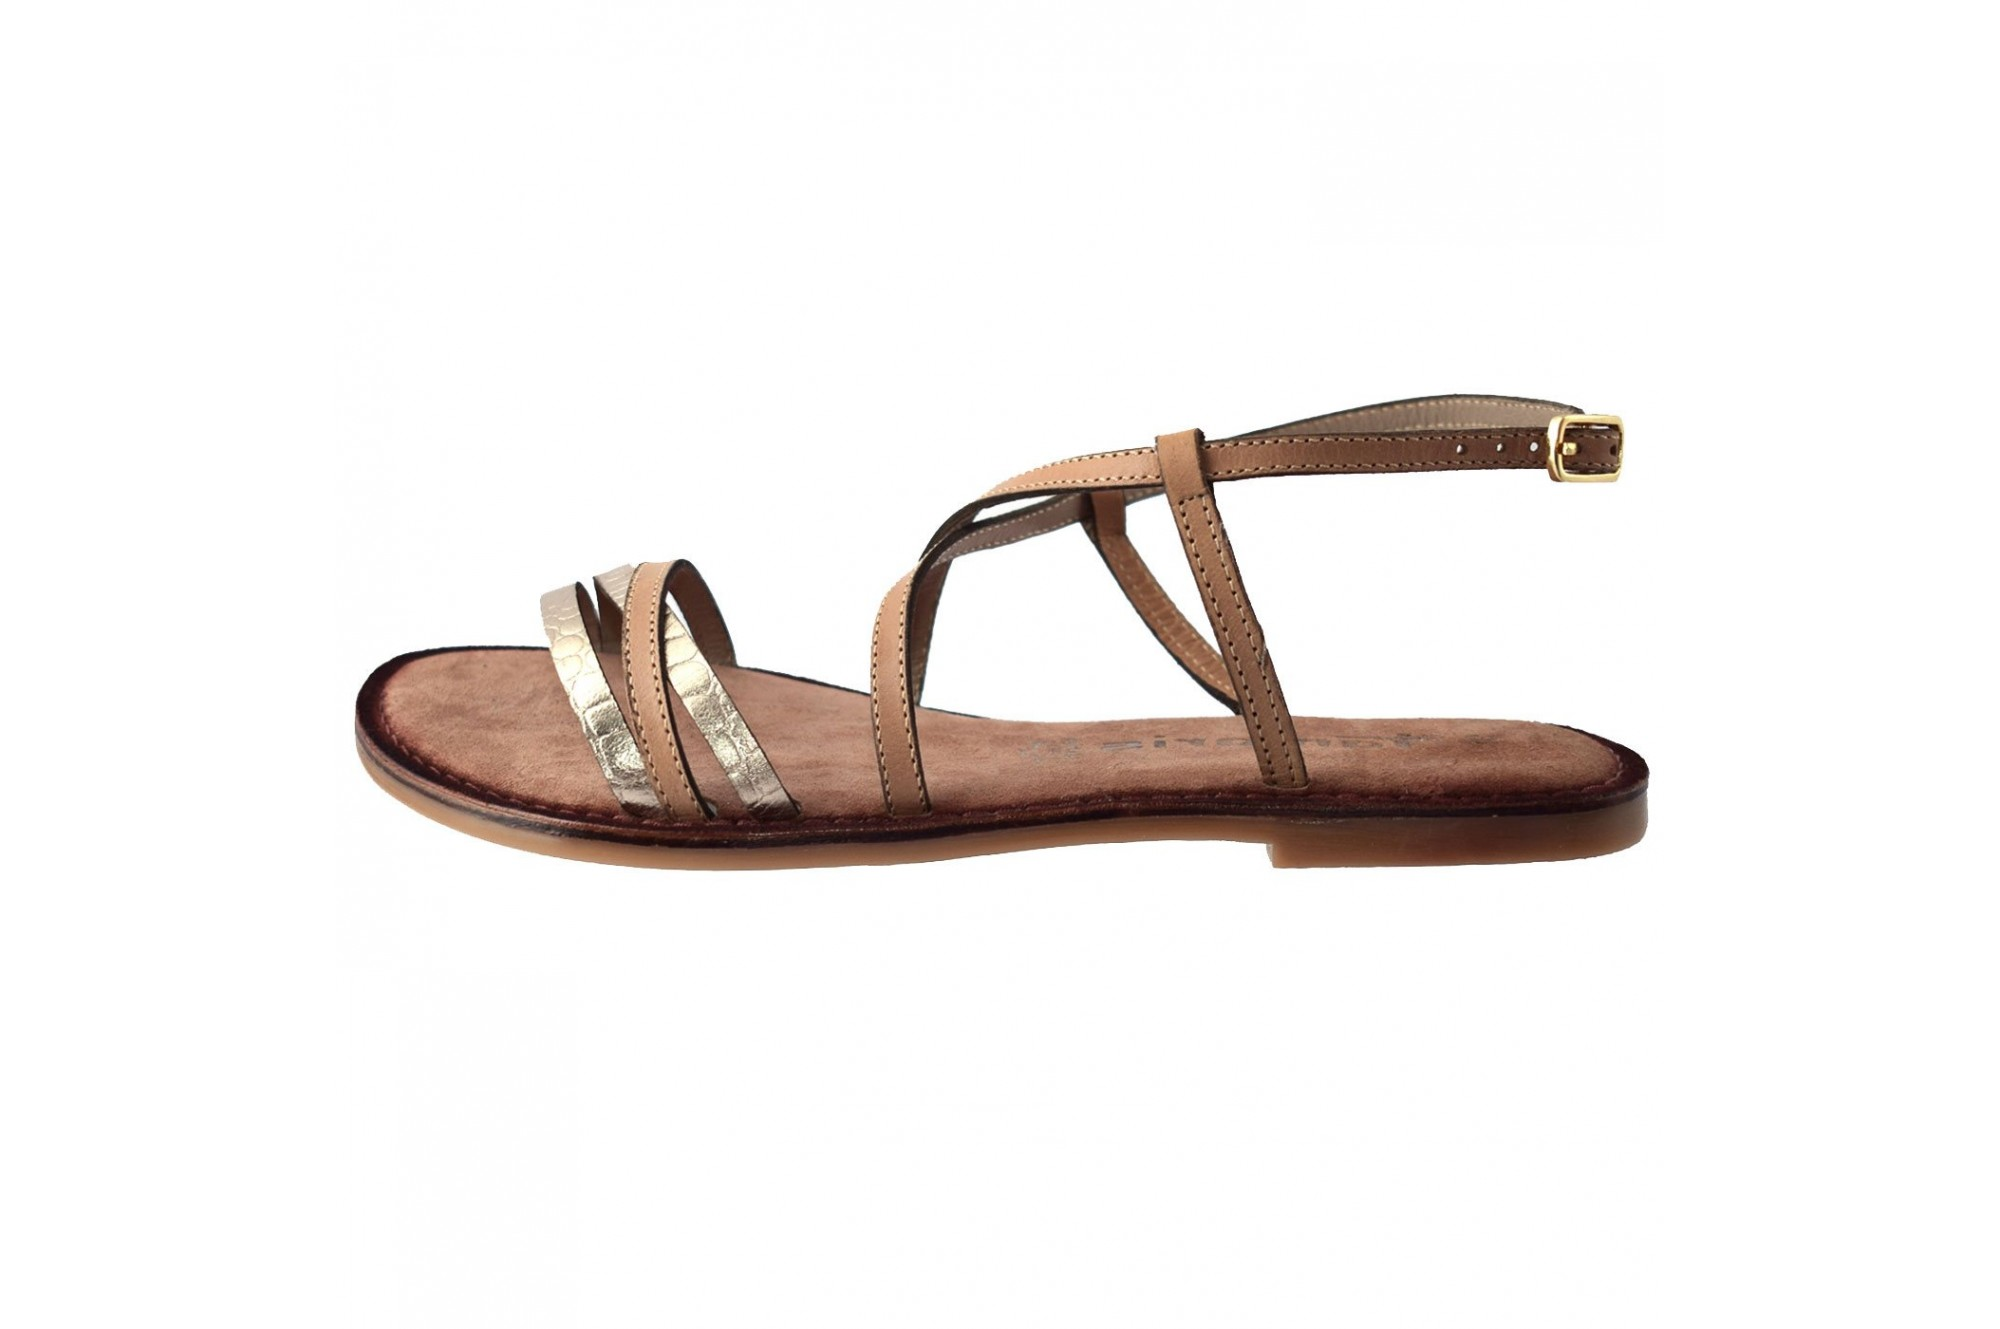 Sandale dama, din piele naturala, marca Tamaris, 28114 02 10, bej